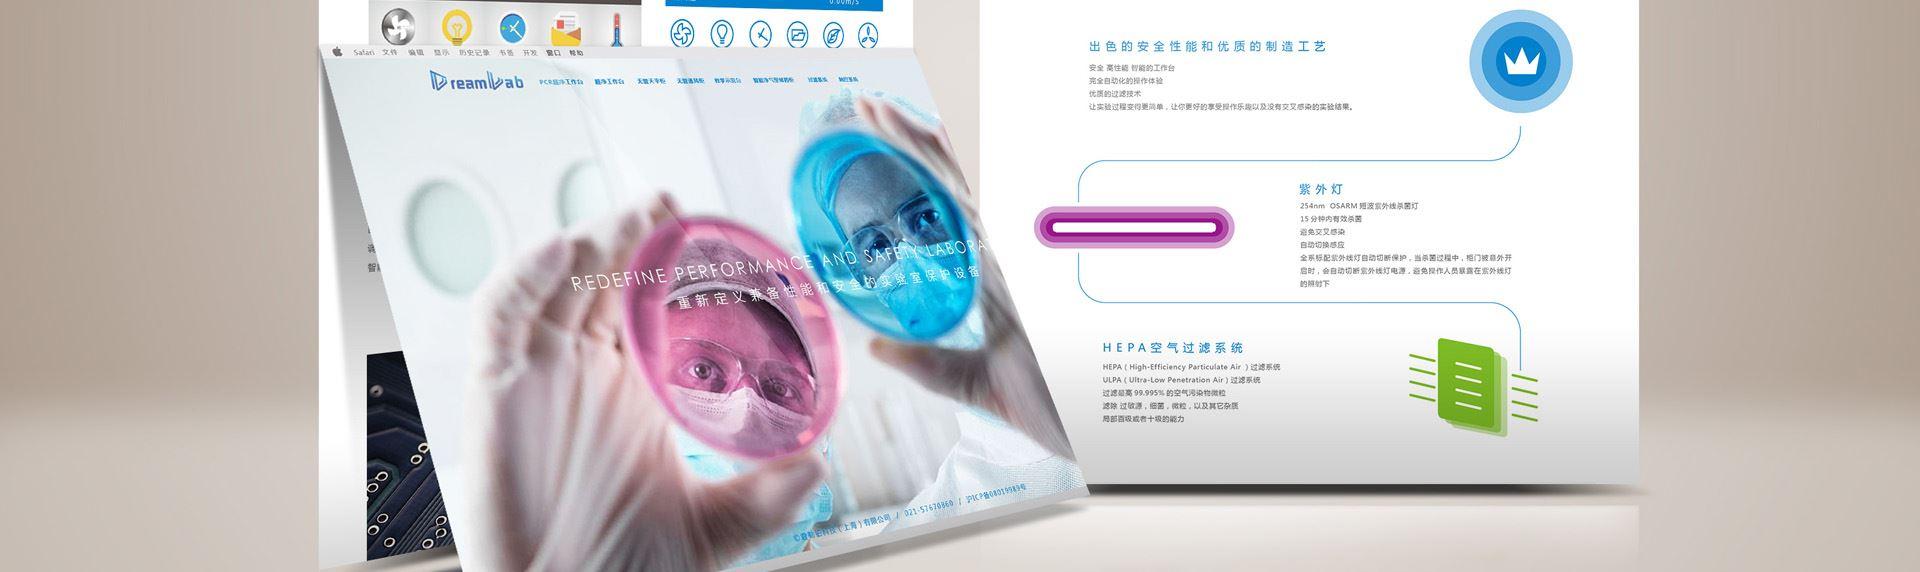 SSC设计-君勒铂网站设计